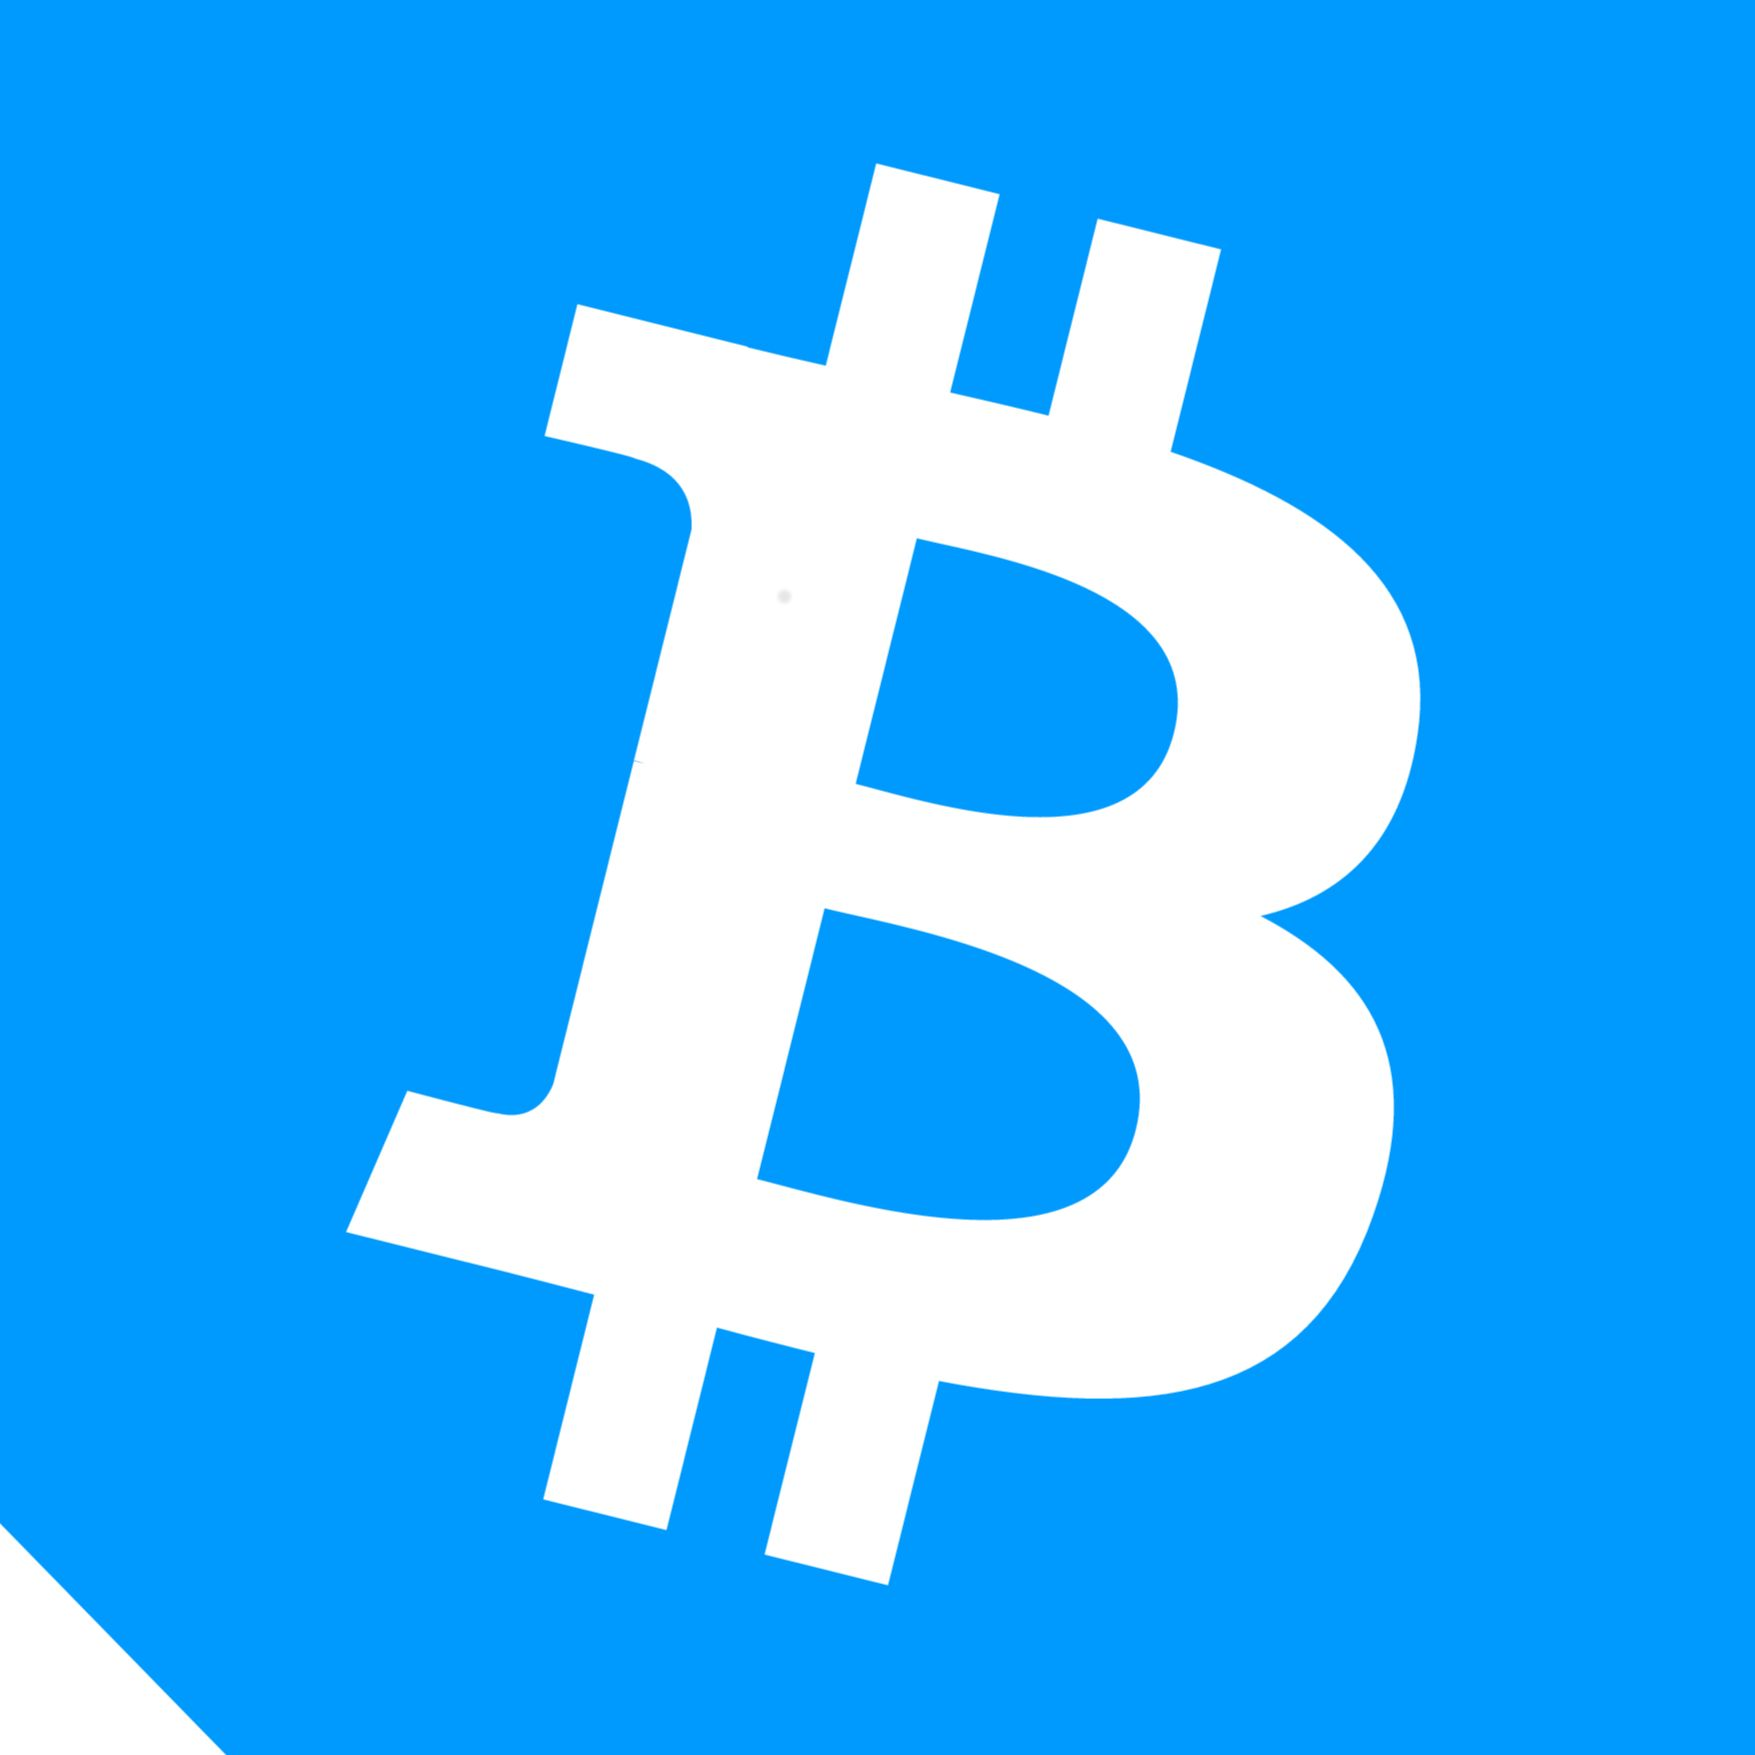 Podcast Episode 8 - Bitcoin, Zimbabwe, And You